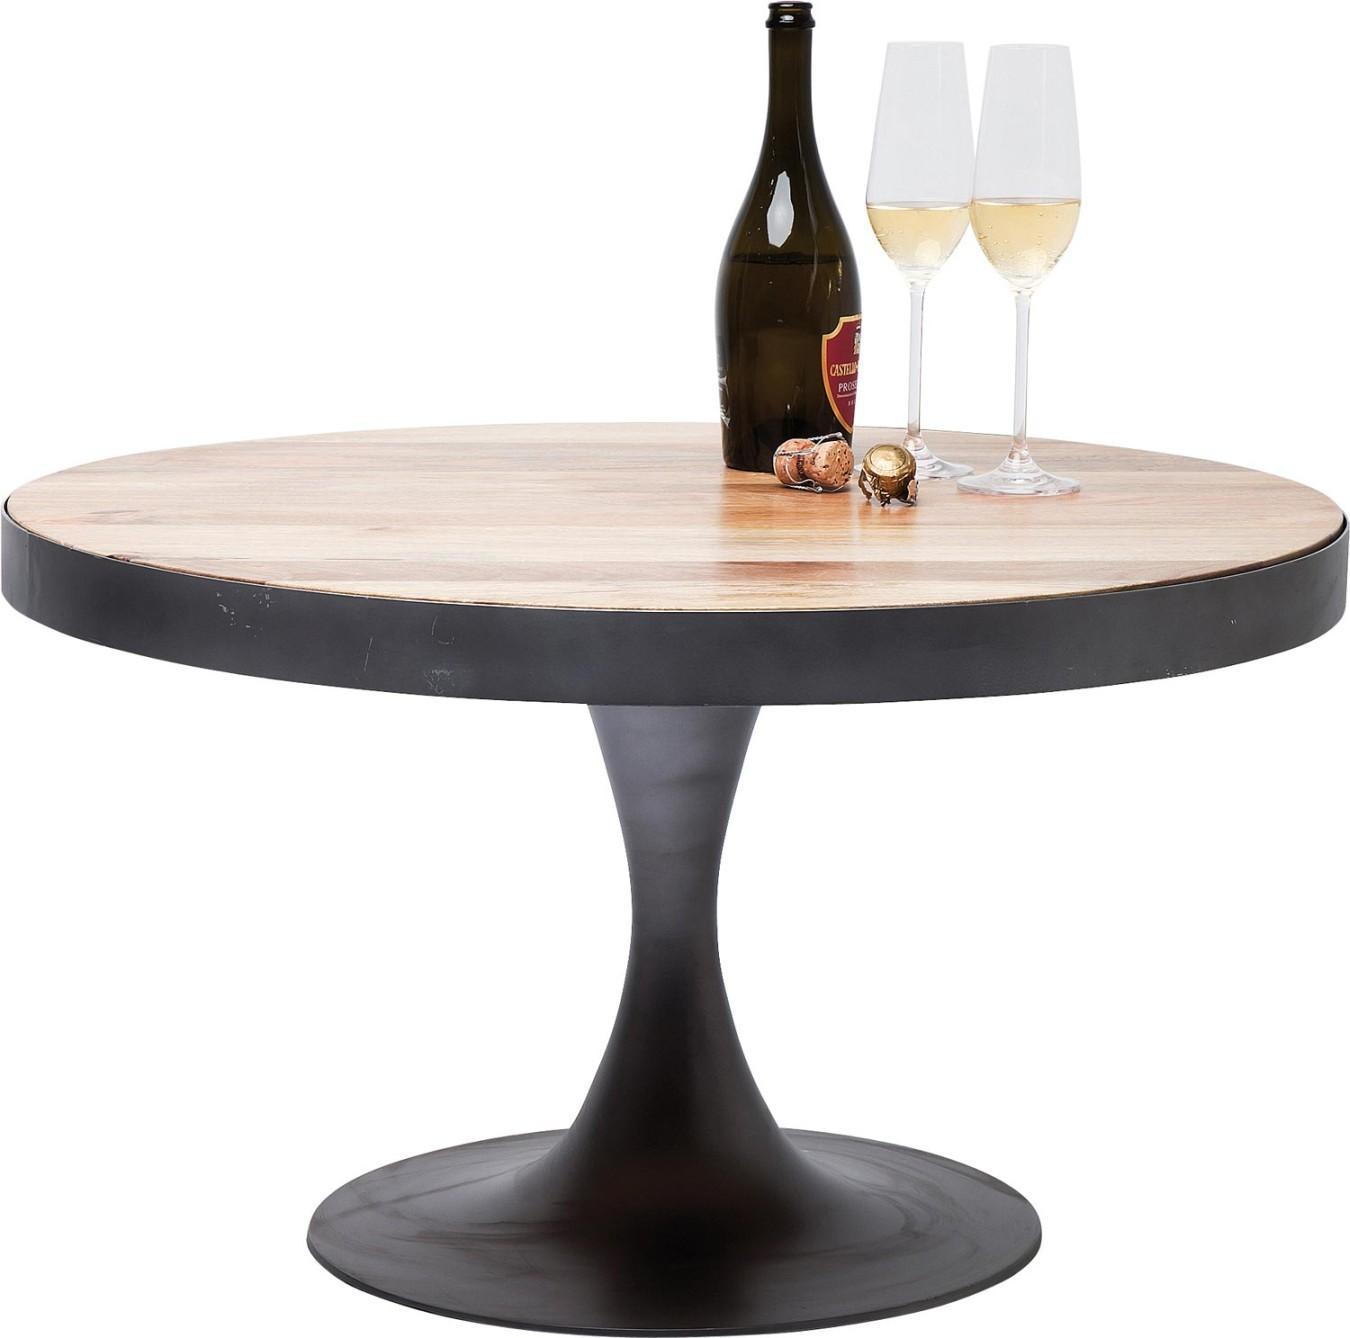 Kare design table tritoo maison et jardin for Table ronde design diametre 80 cm